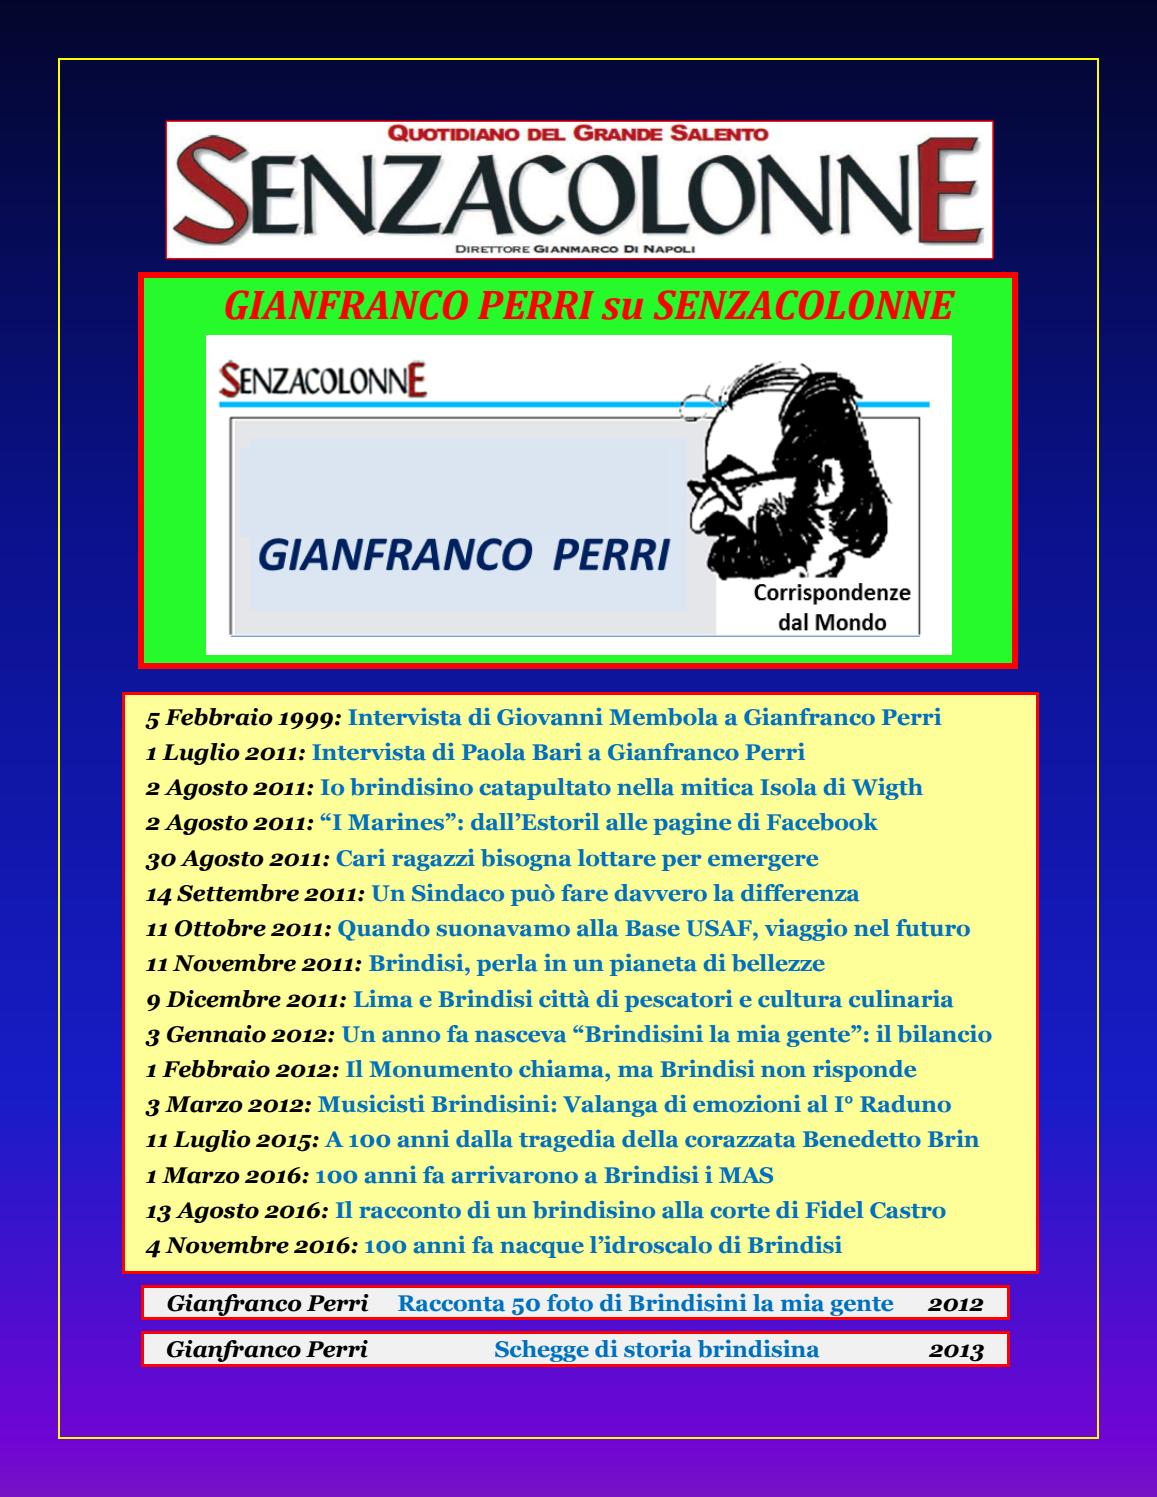 bf04589044 Gianfranco Perri su Senzacolonne by Gianfranco Perri - issuu